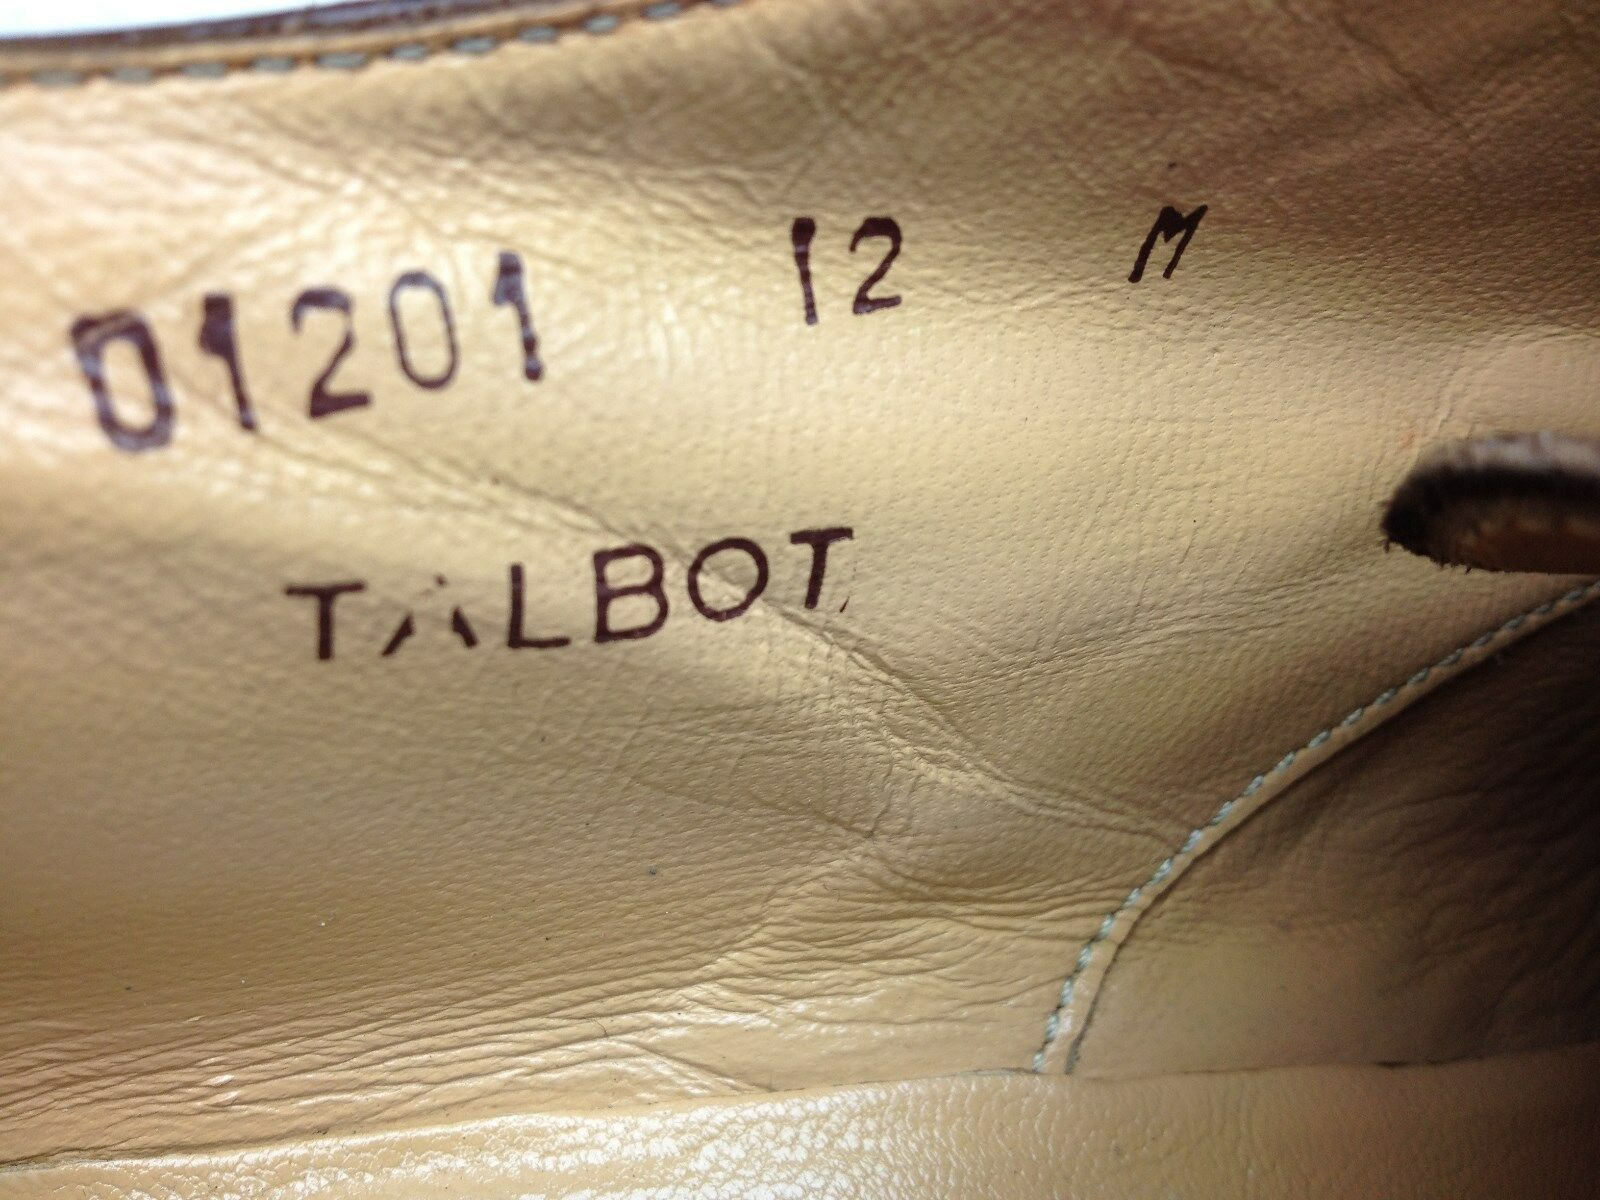 braun LEATHER BRUNO TOE MAGLI TALBOT CAP TOE BRUNO LACE UP OXFORD BUSINESS DRESS schuhe 12M 937703